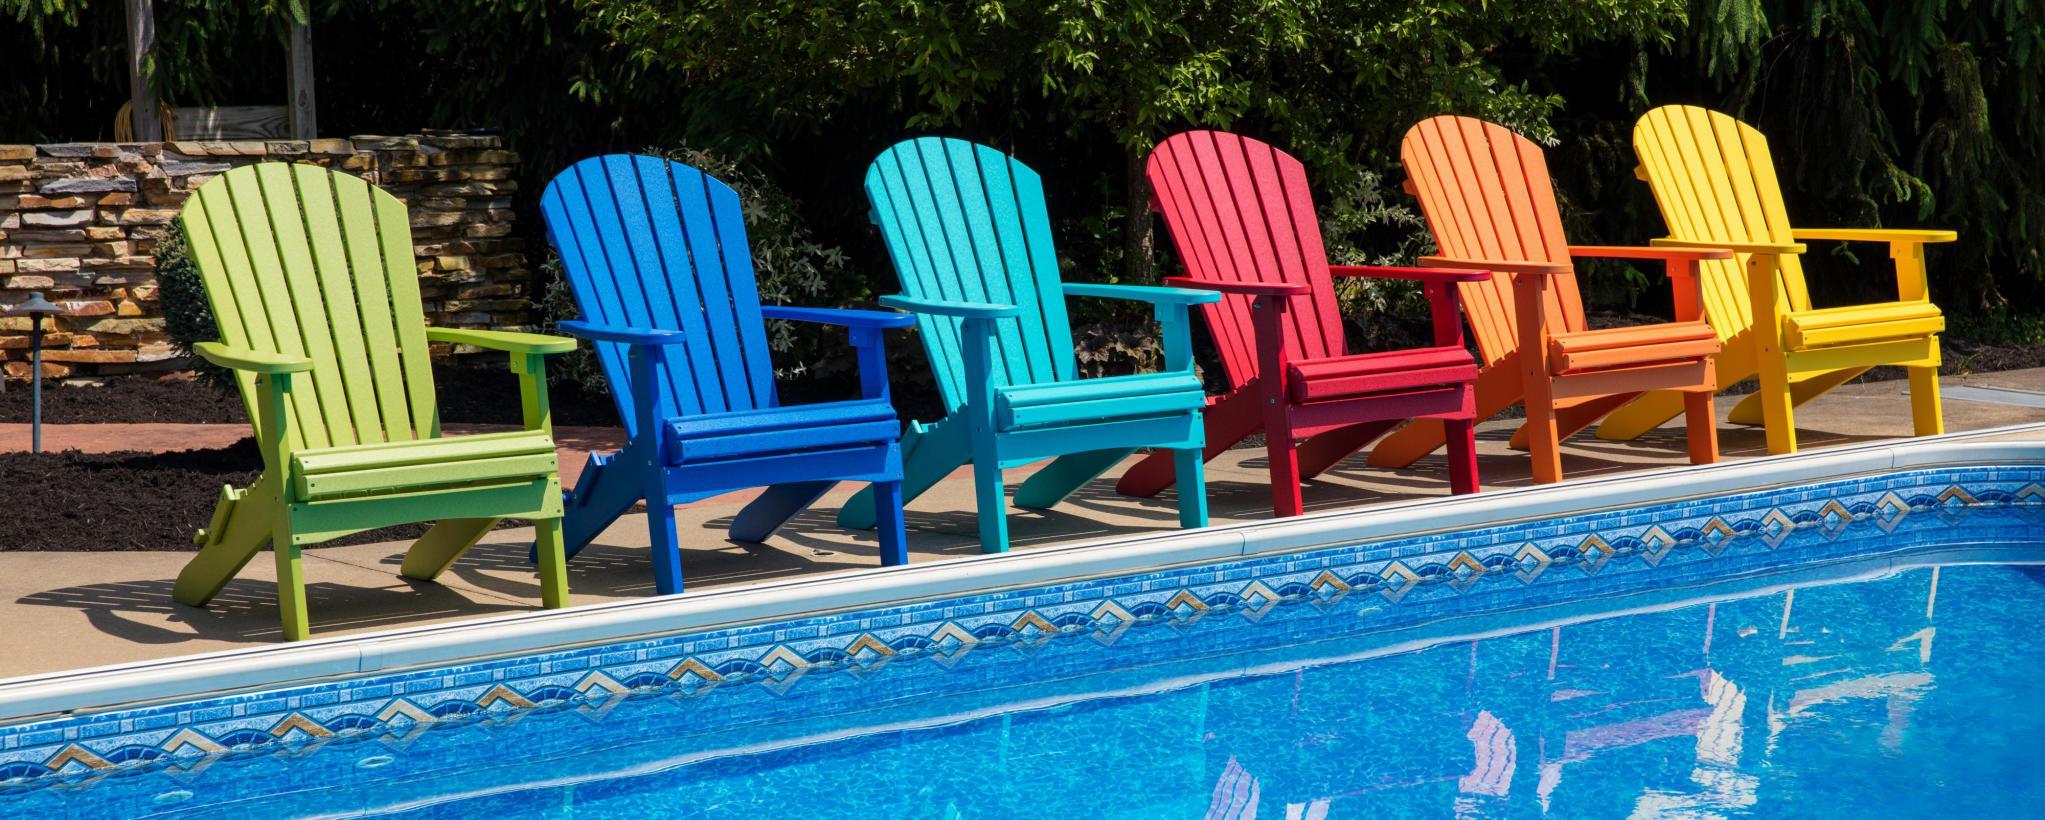 Folding Adirondacks in front of pool